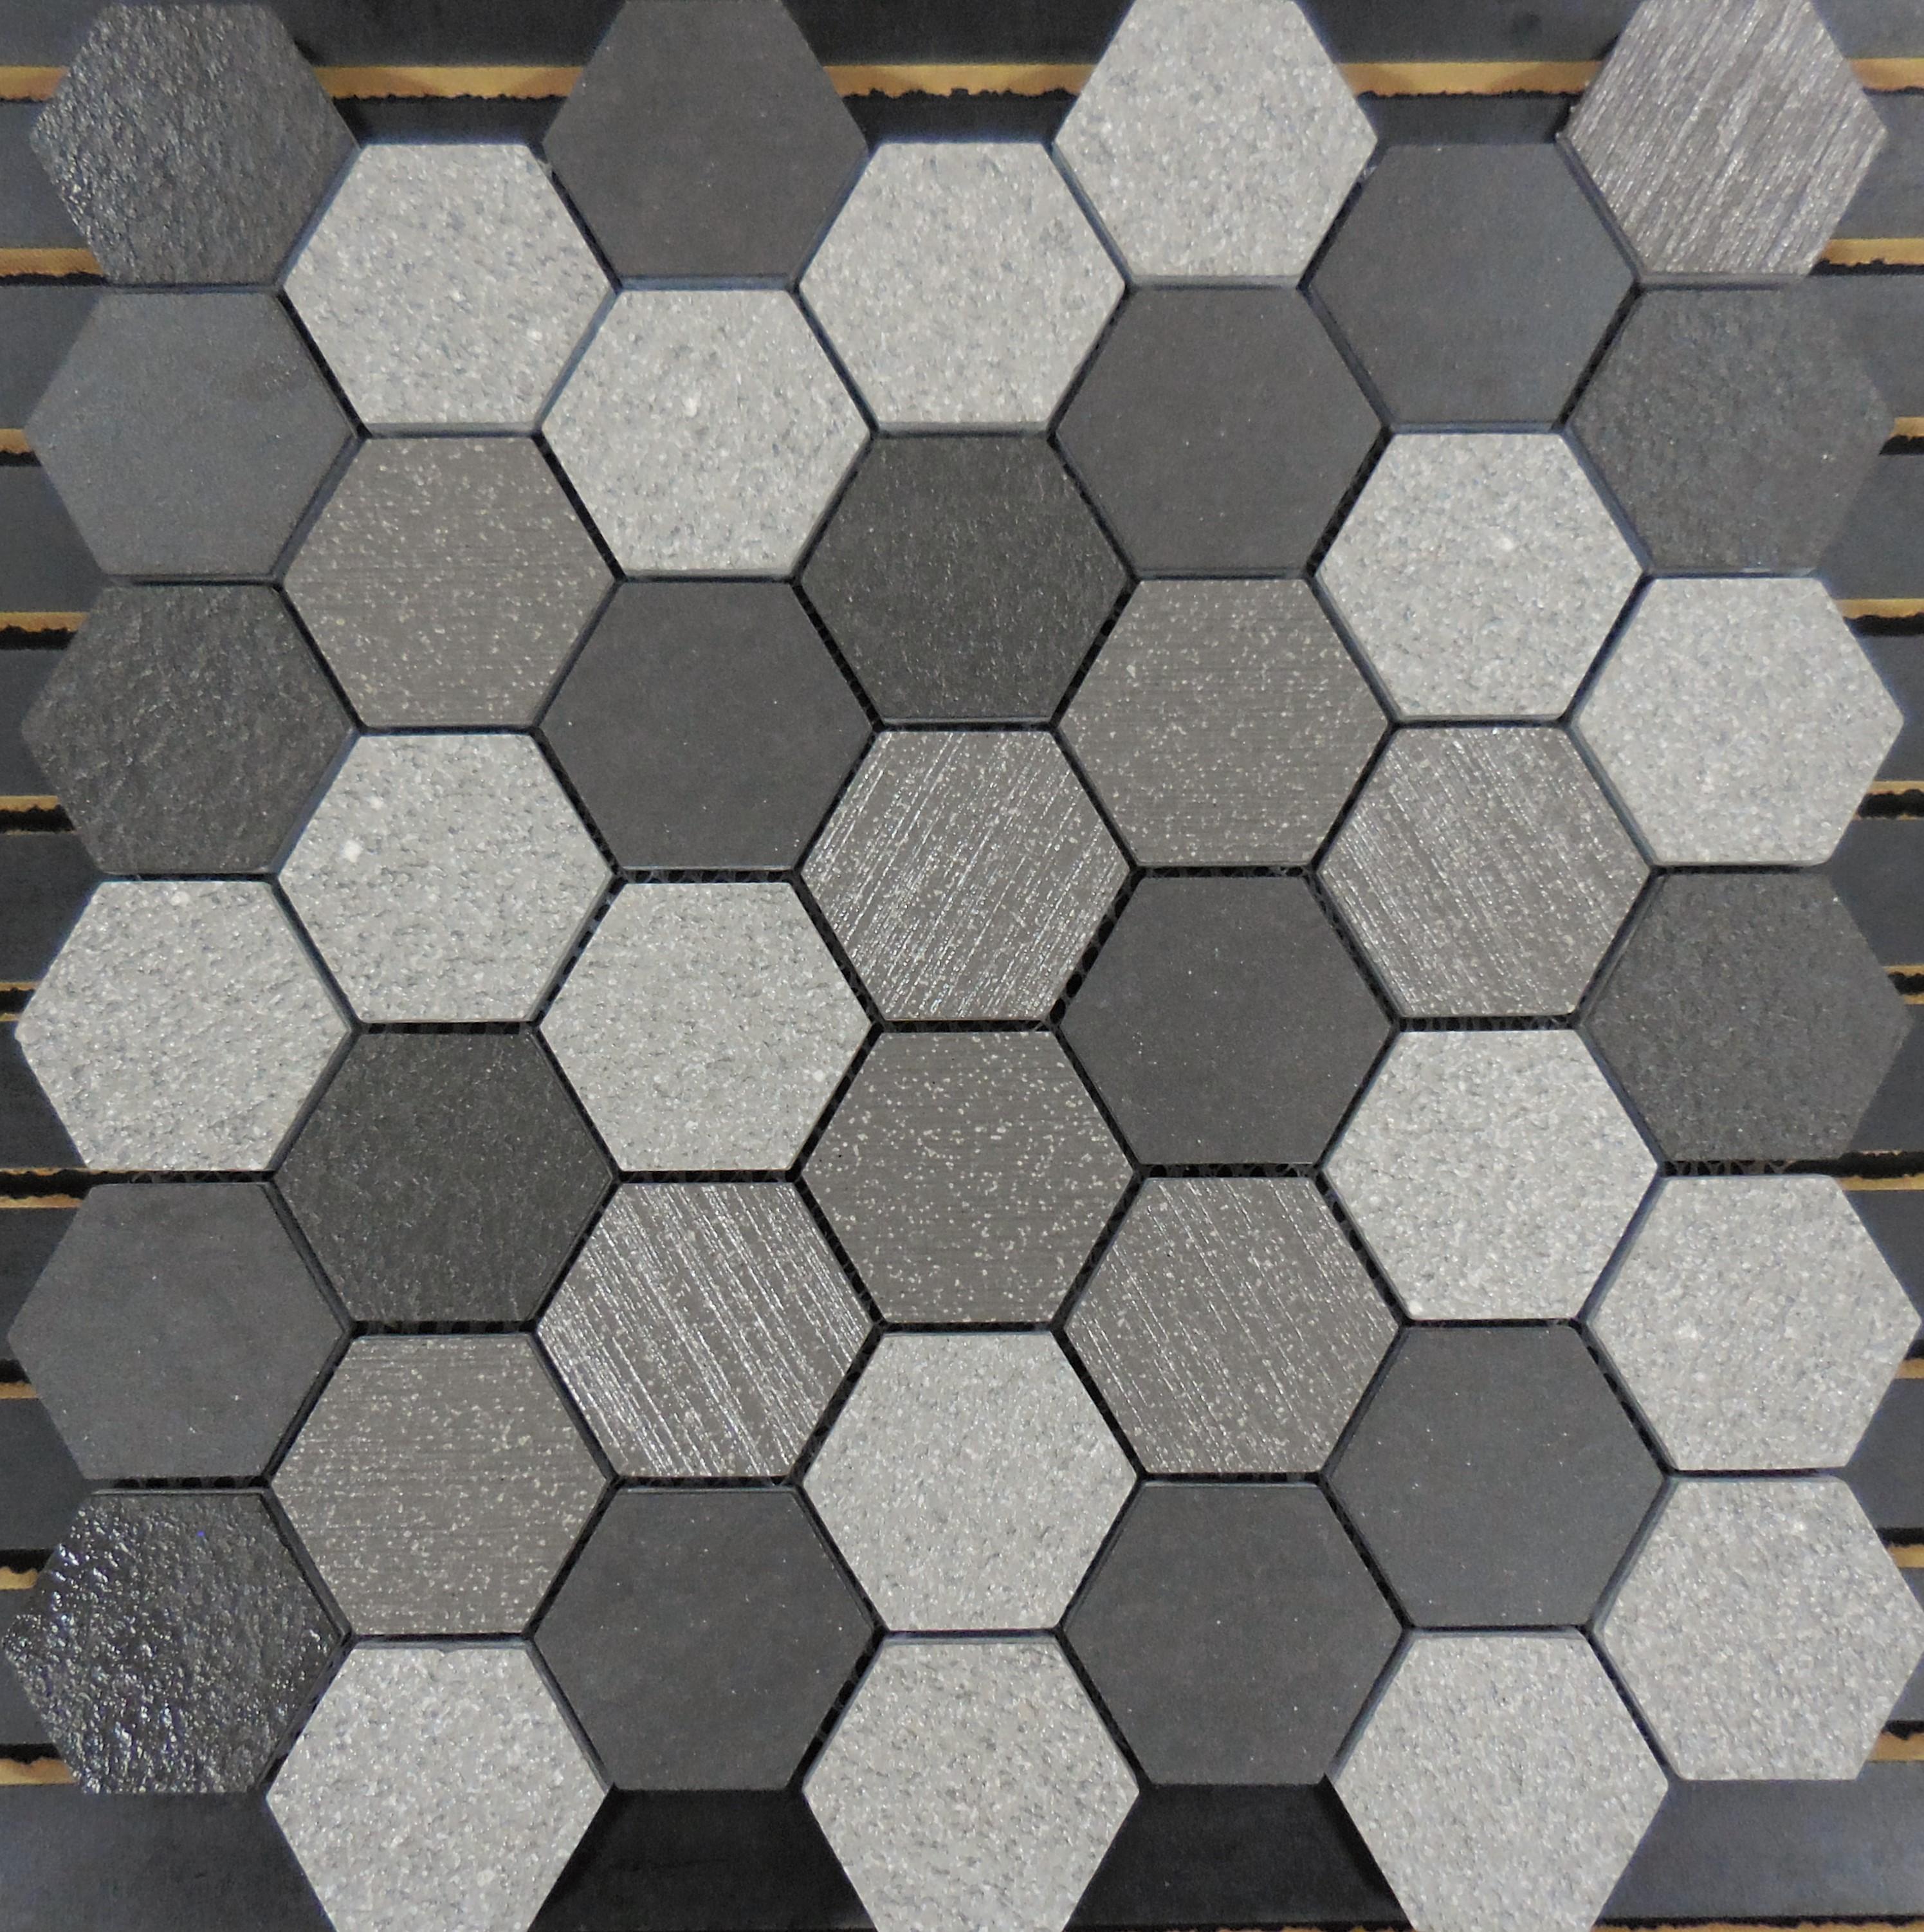 Pth2017 Porcelain Mosaic Grey 2 Hexagon